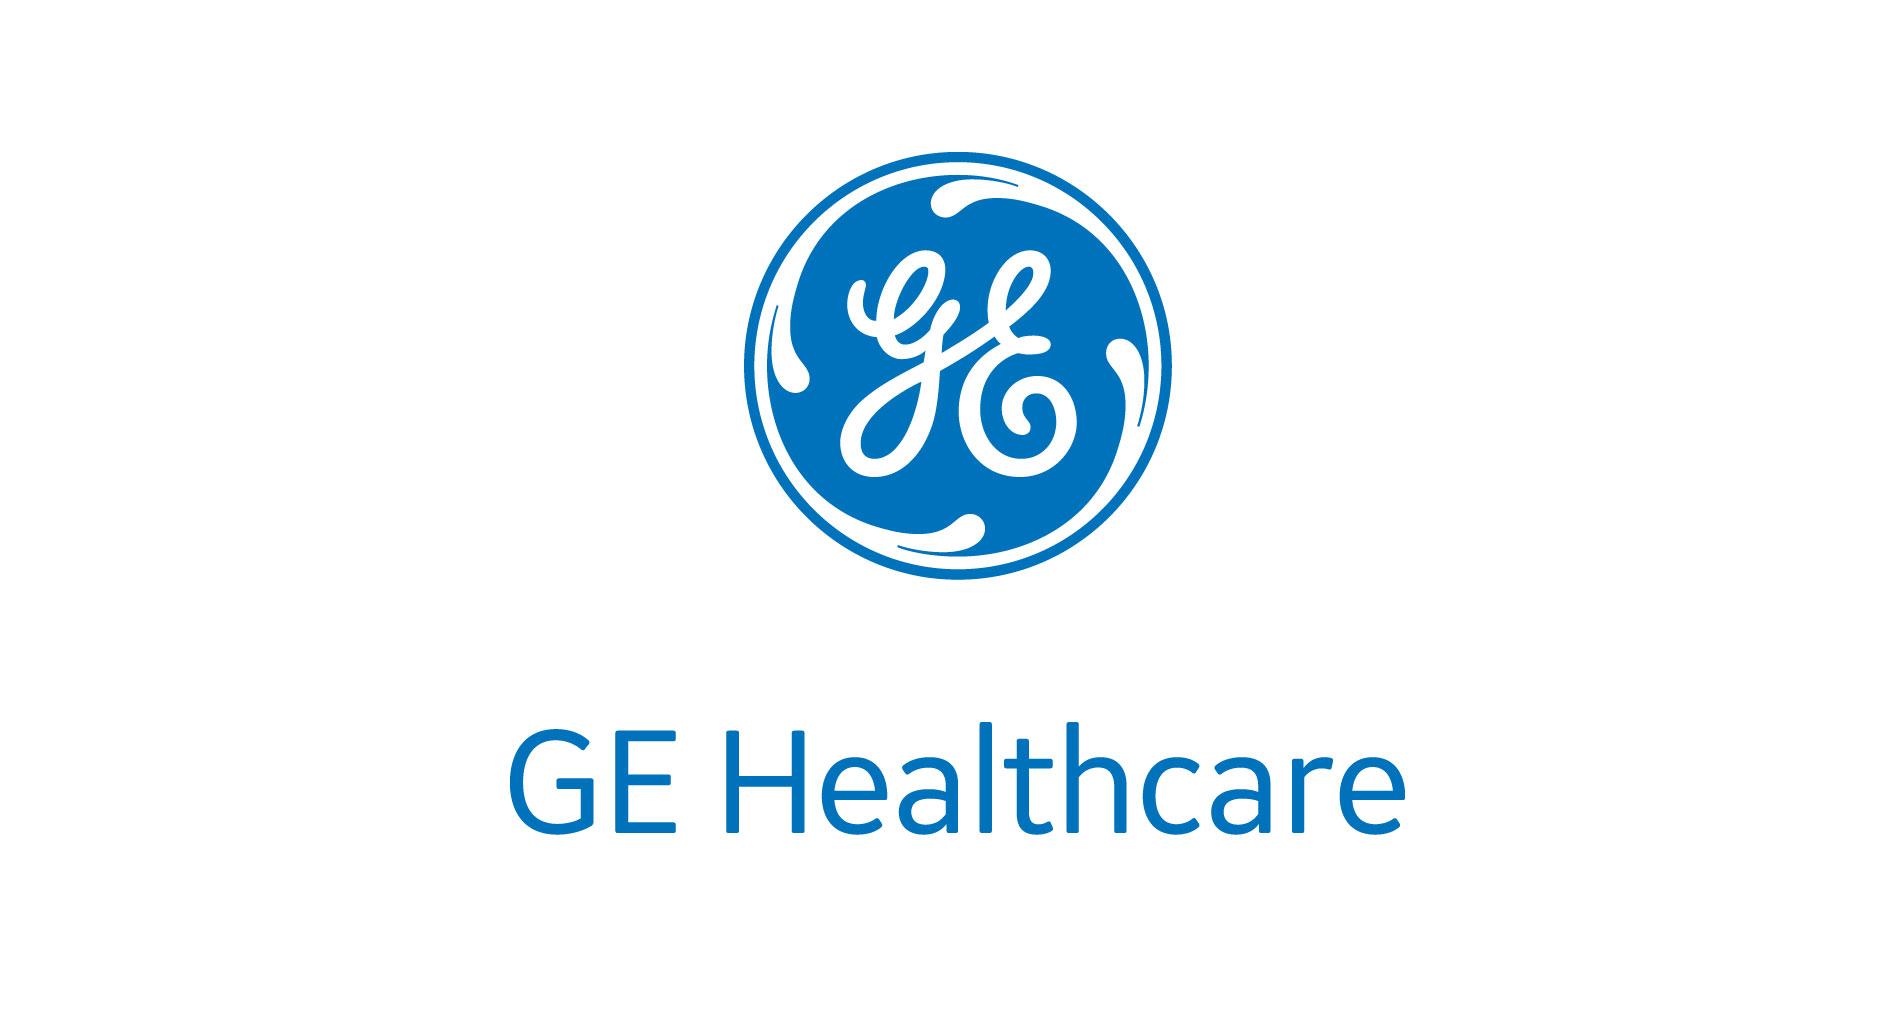 GE-Healthcare-Monogram_Stacked_Bluev3